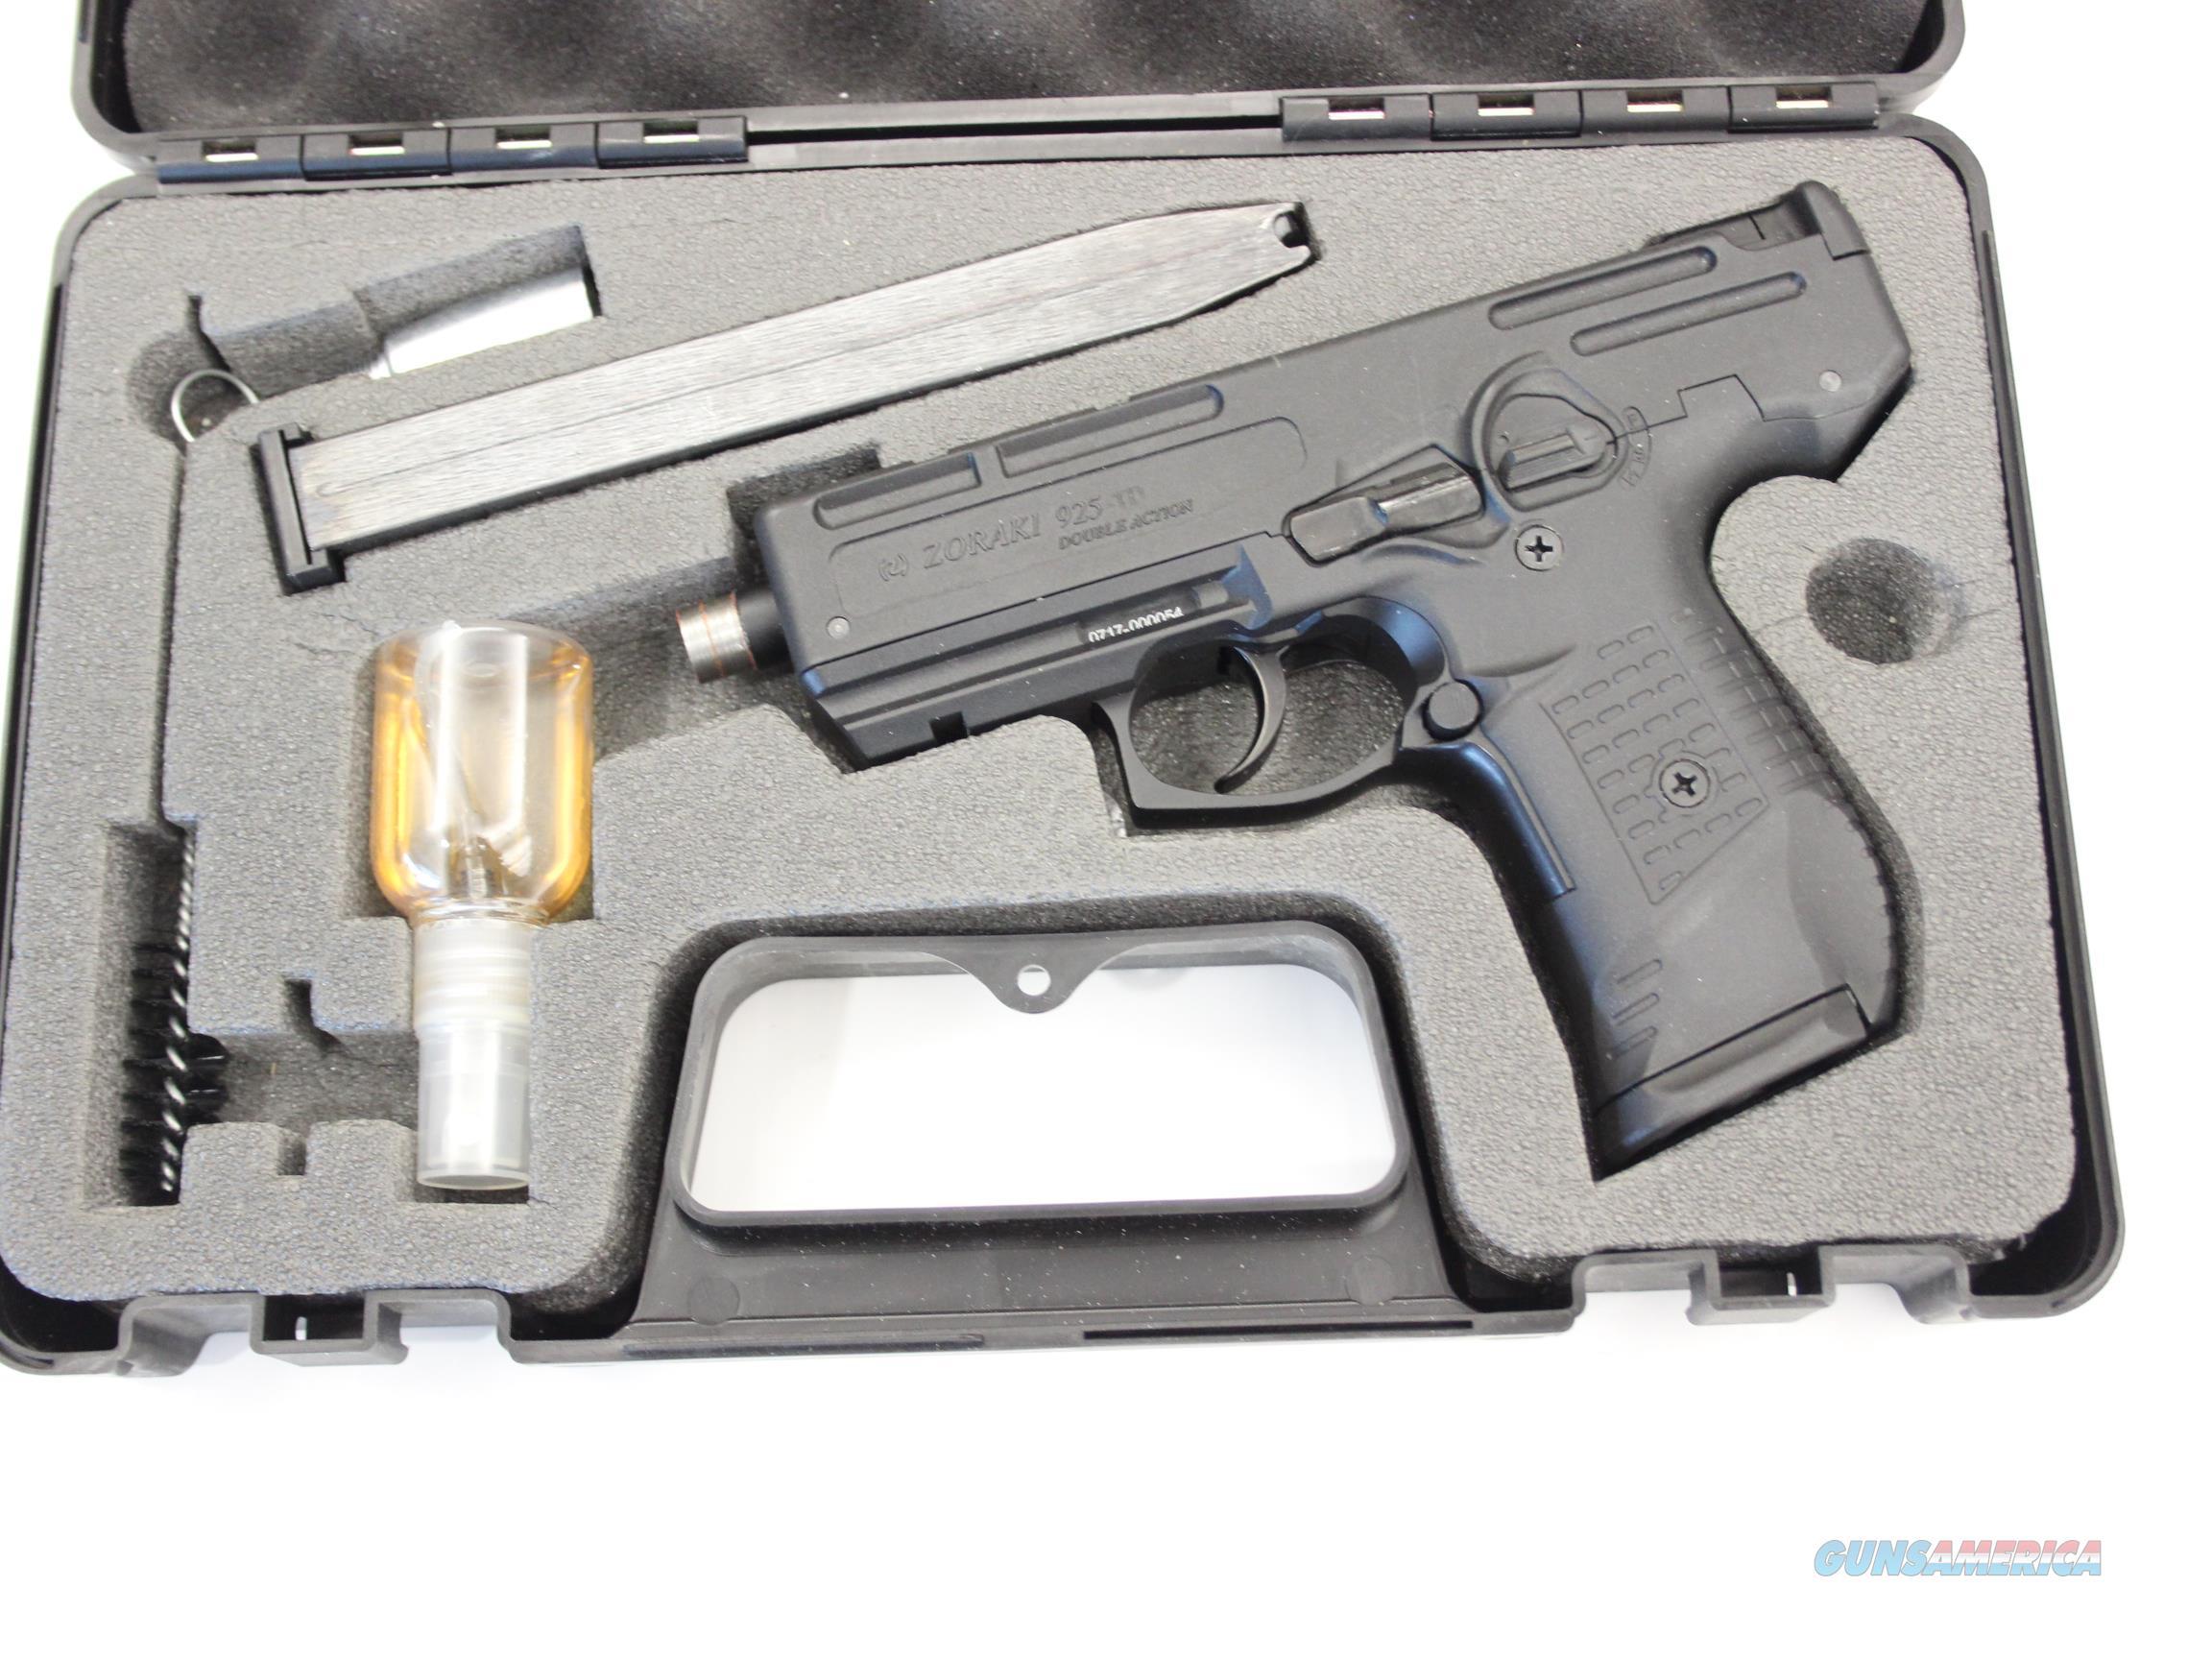 Zoraki M925 Black - Full Auto Machine Pistol Front Firing Blank Gun